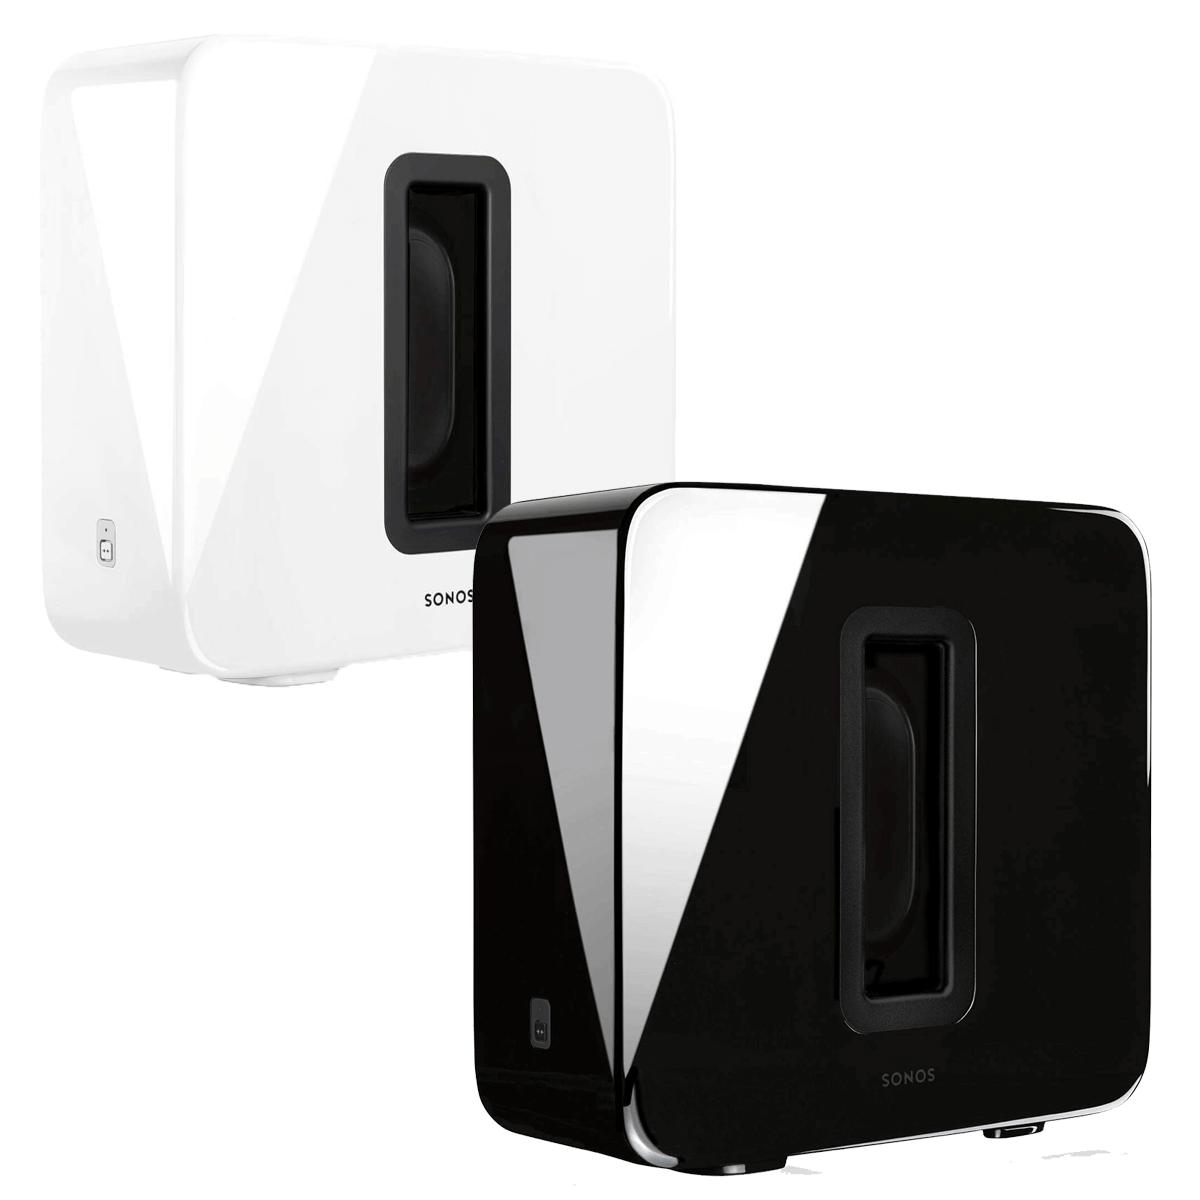 Sonos SUB I WLAN Subwoofer für Sonos Smart Speaker System